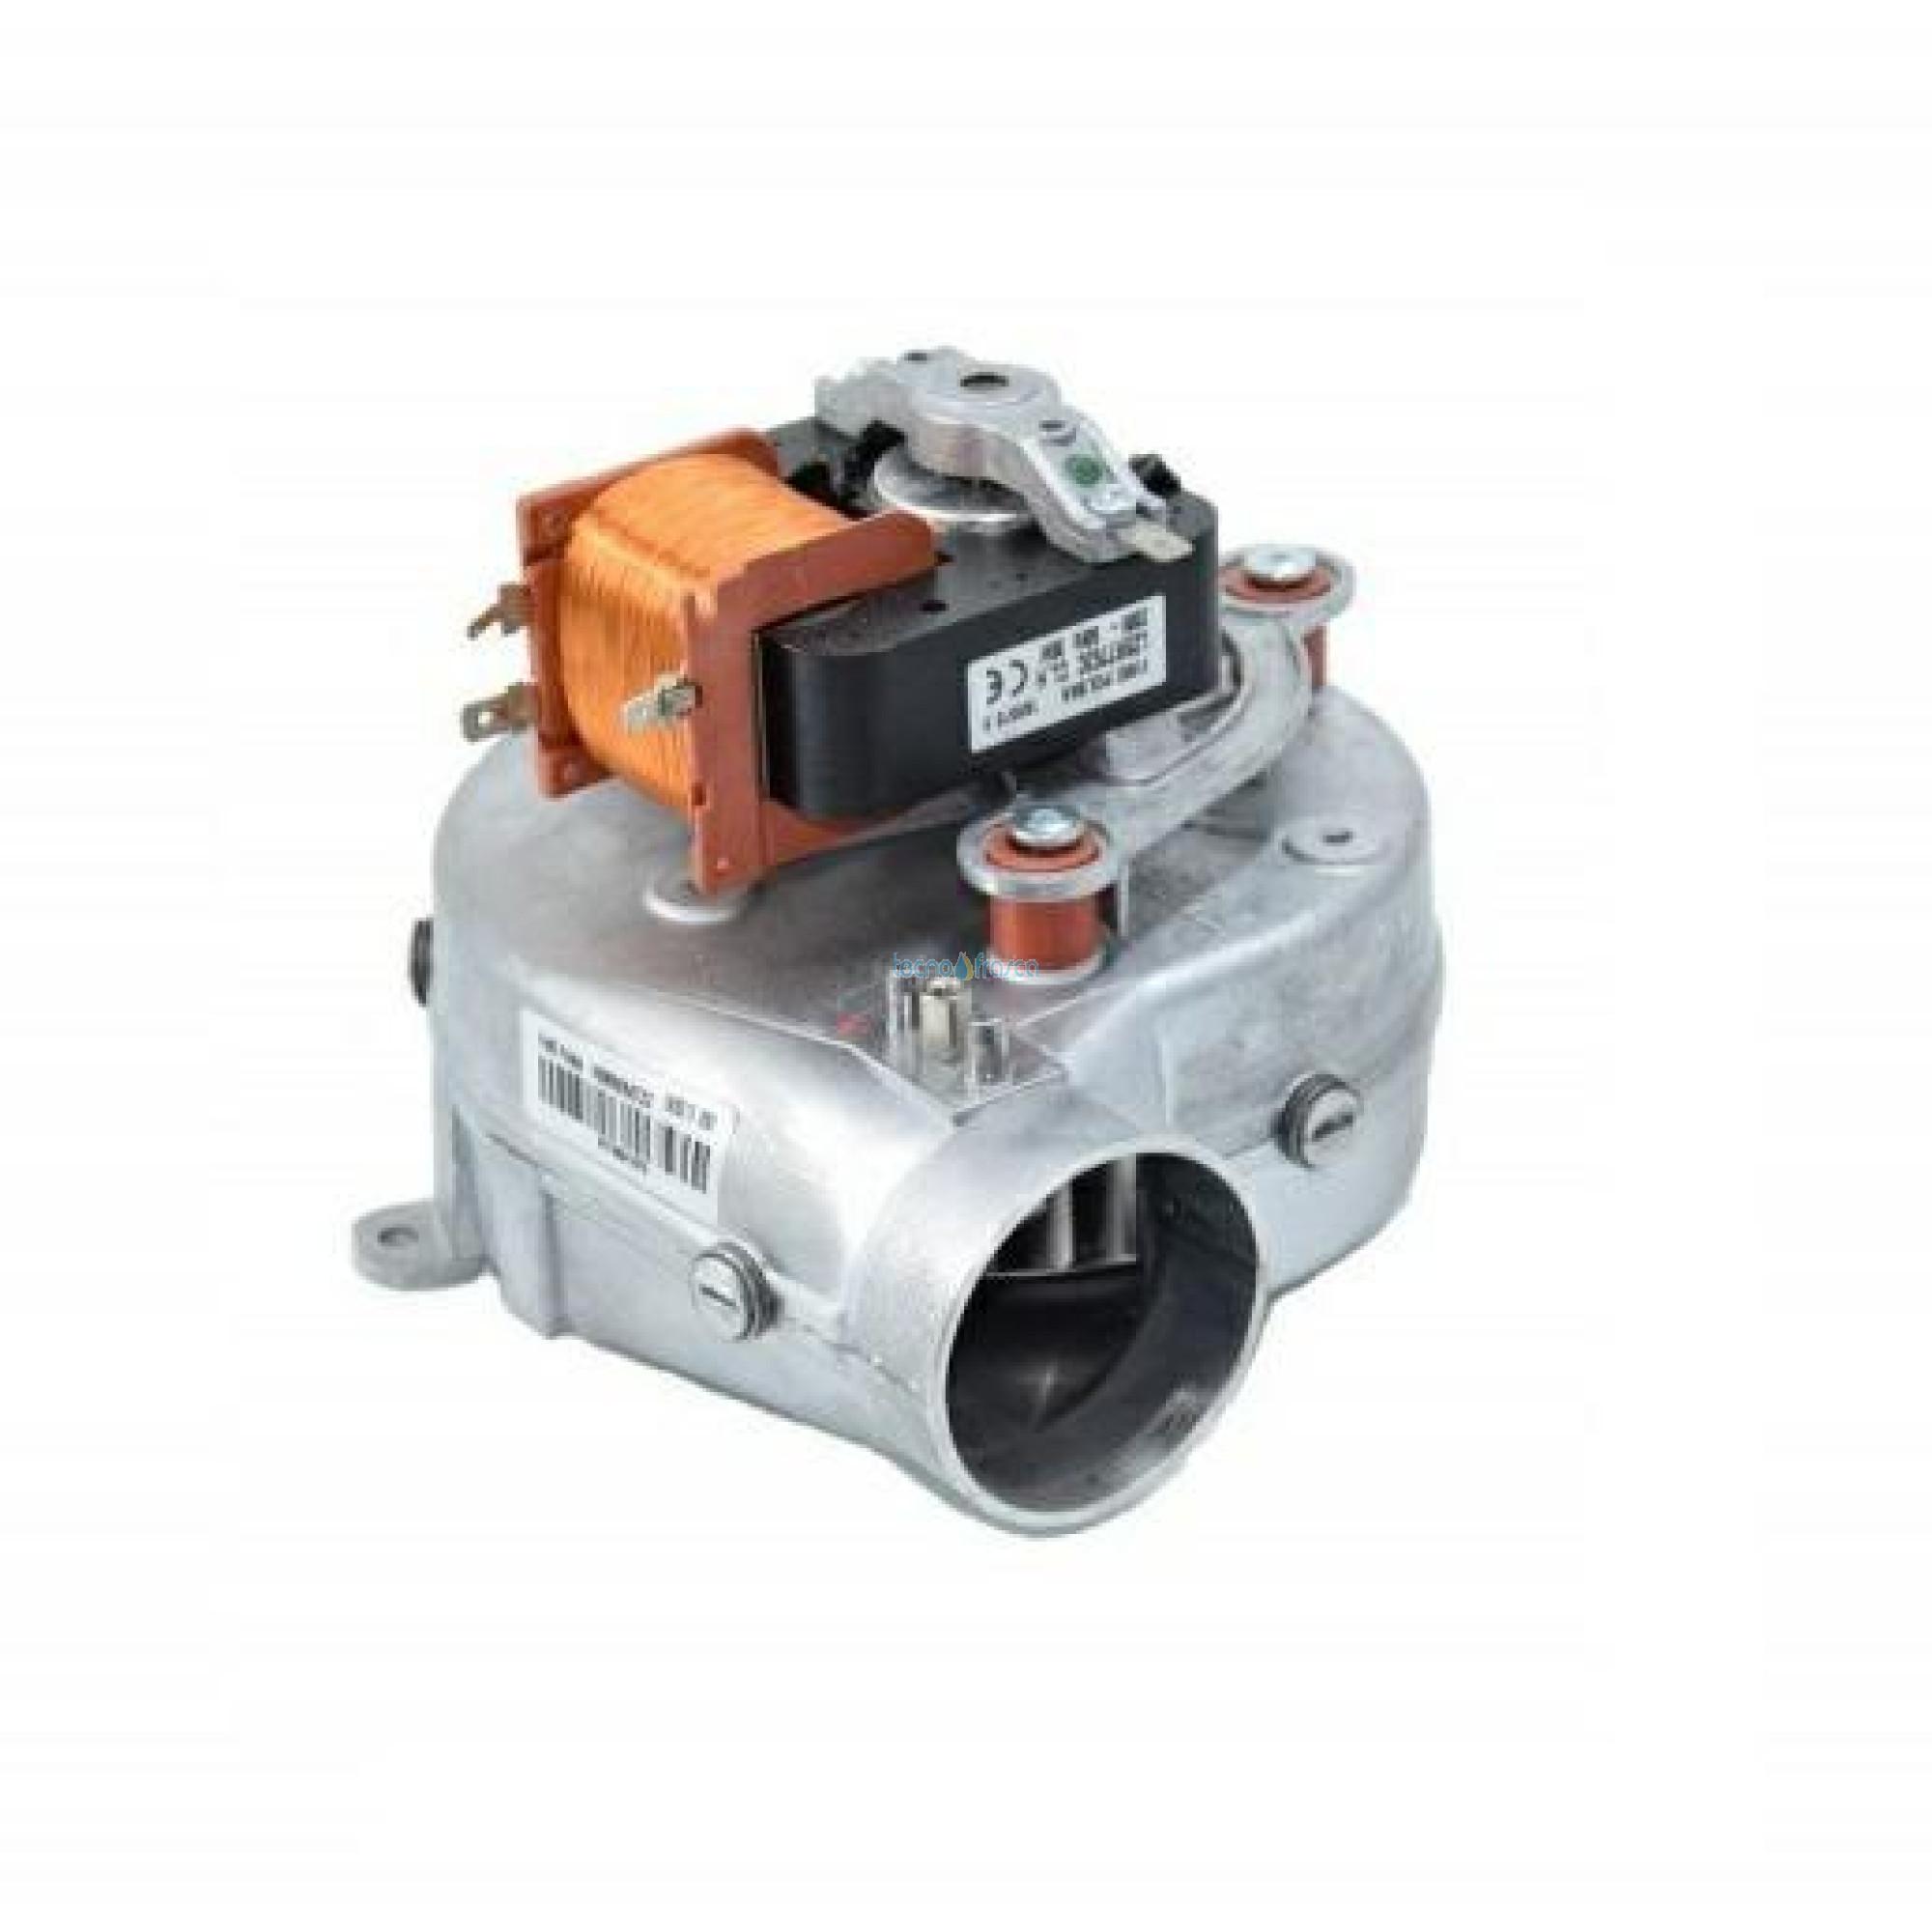 Junkers bosch estrattore ceraclass smart zwa24-2a 8716011297